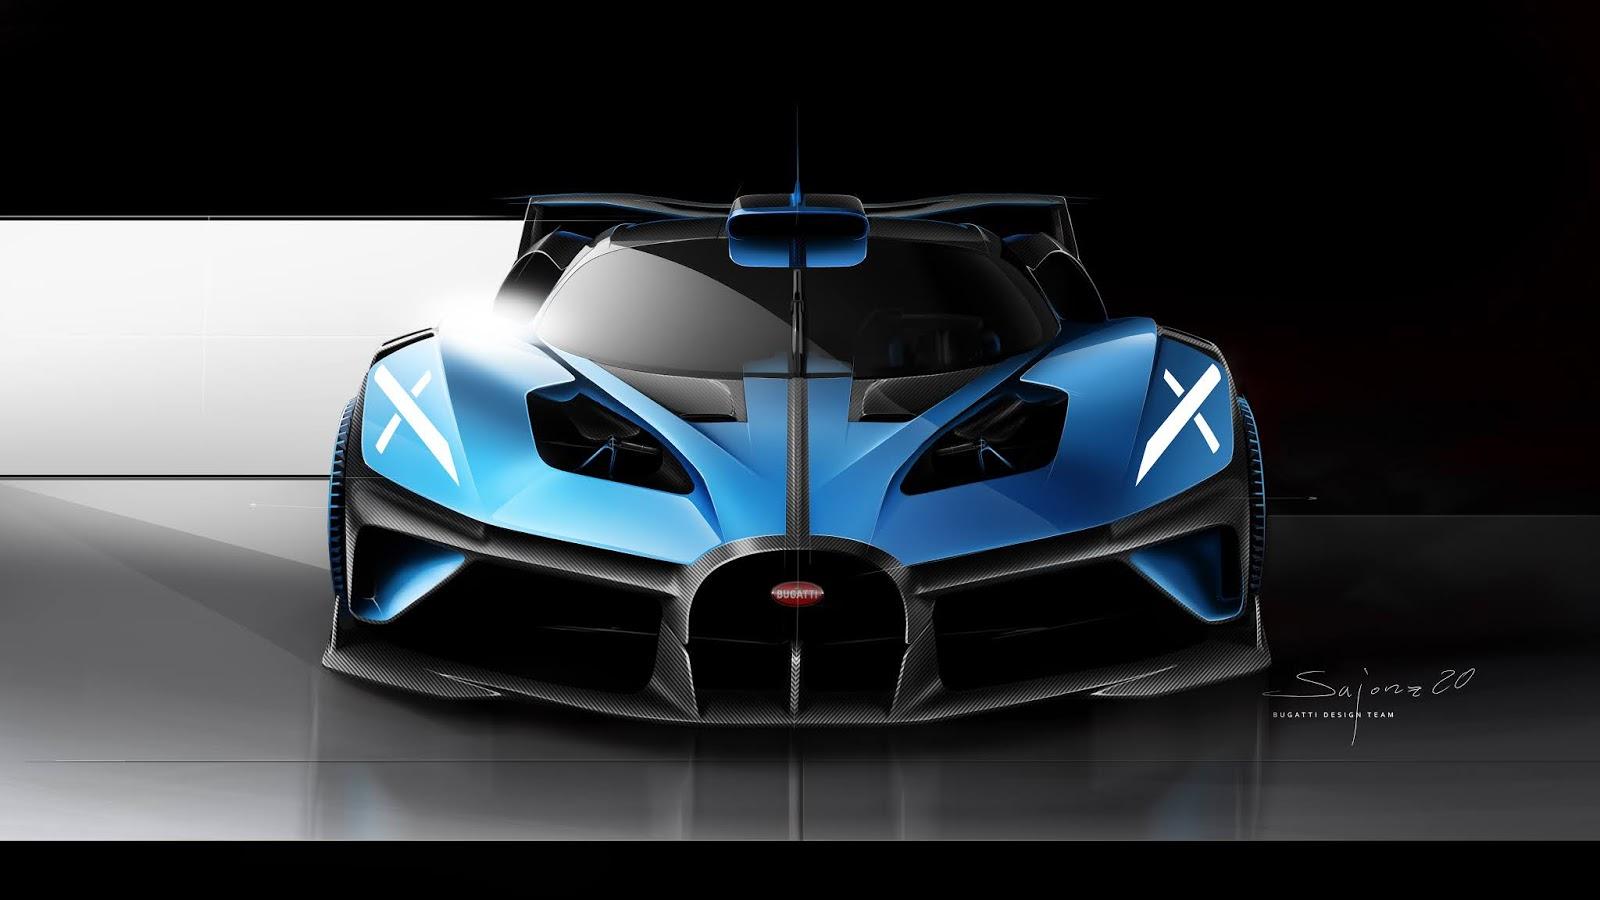 Bolide : Η Bugatti των 0.67 κιλών/ίππο